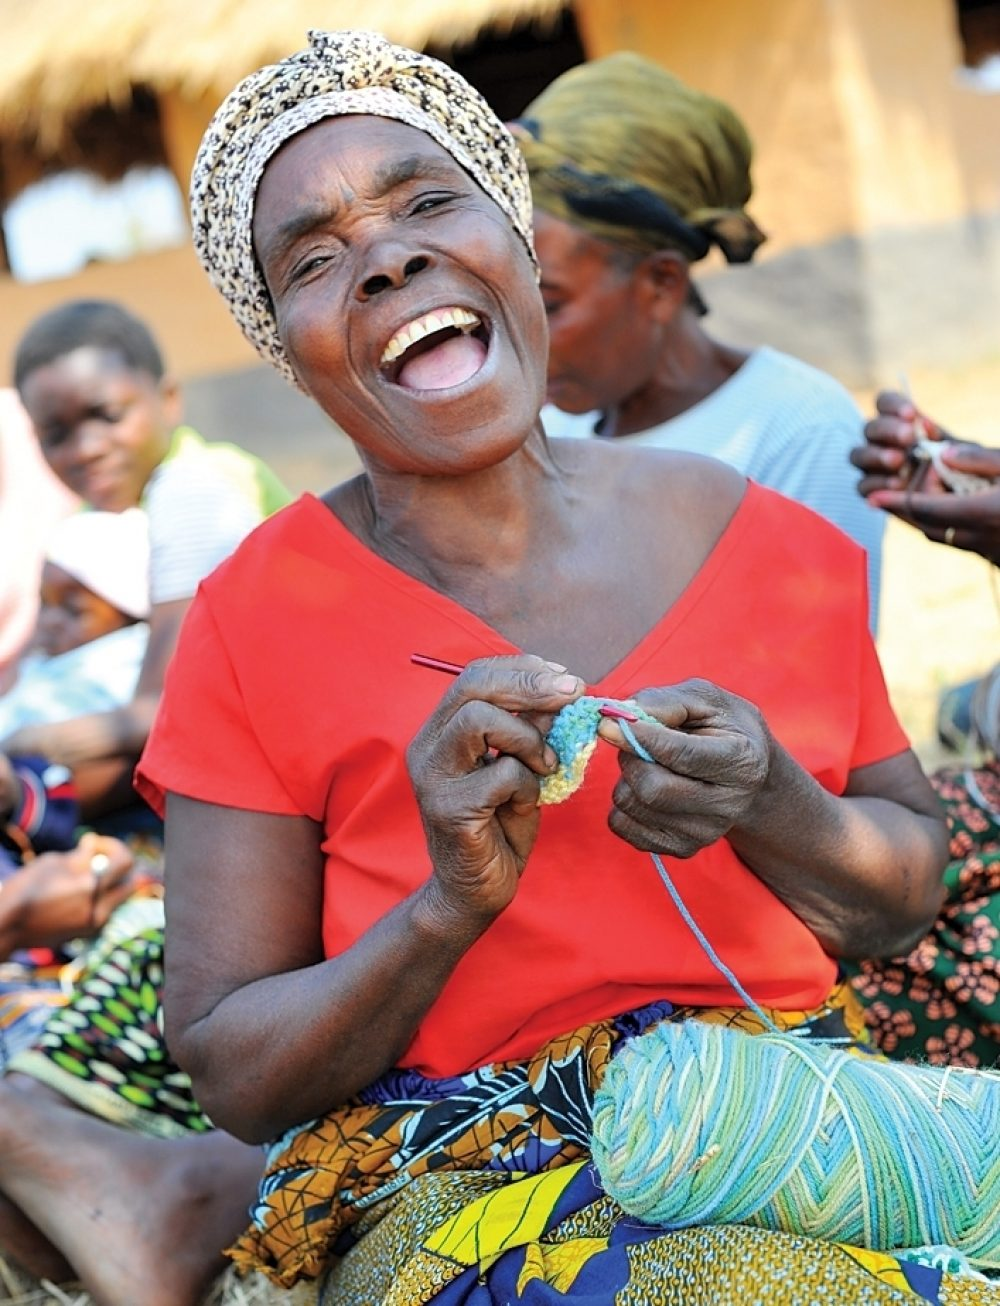 A member of the women's group crochets in Chishiko, Zambia.